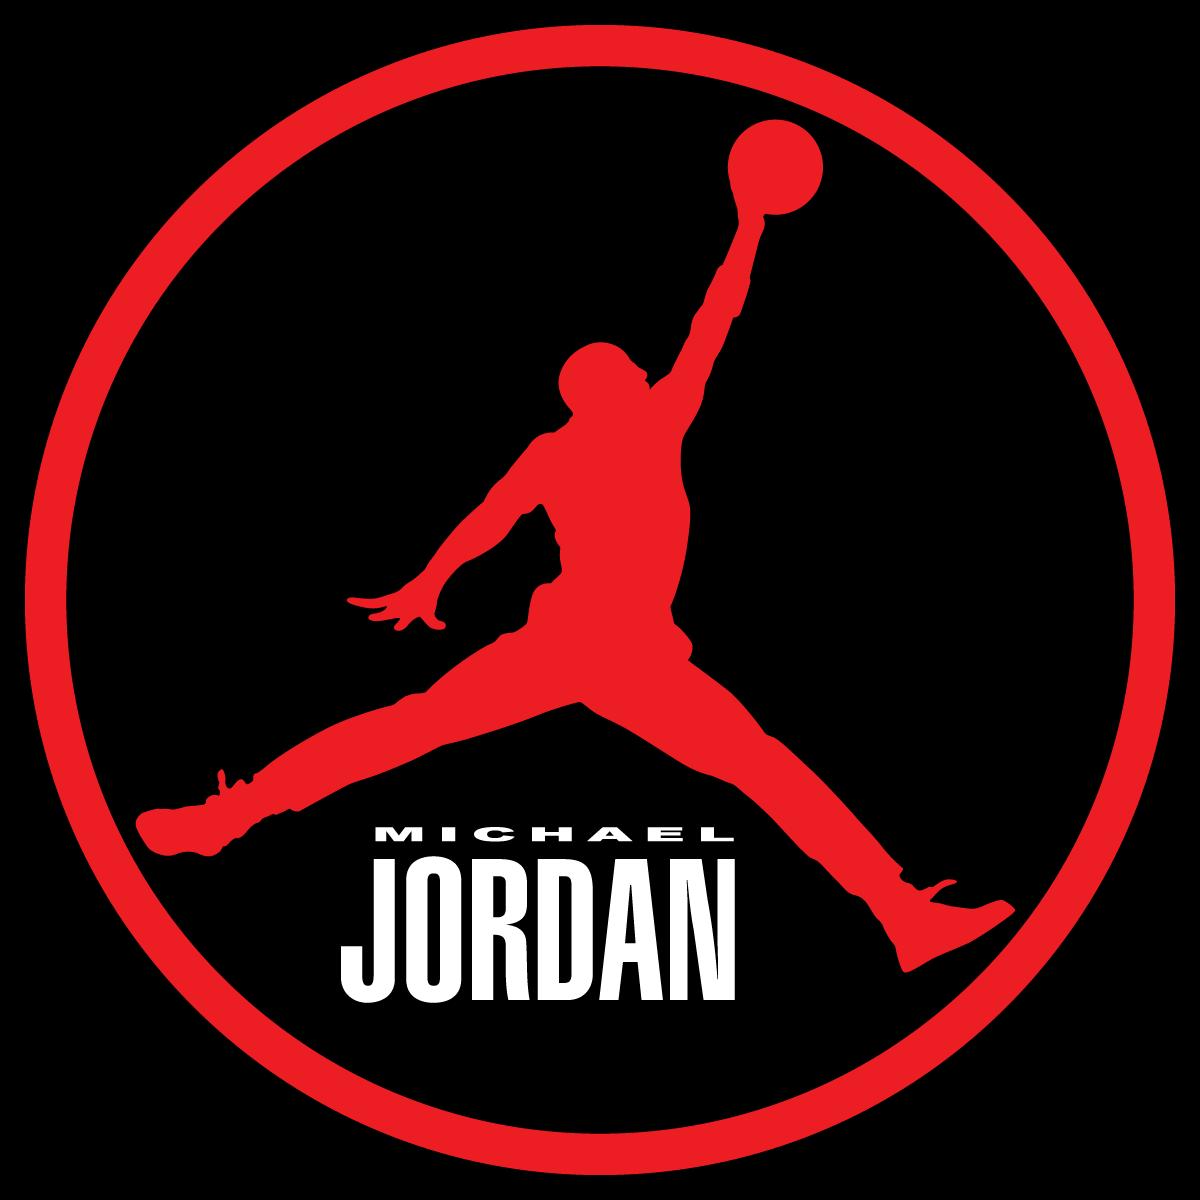 Michael jordan logo clipart freeuse library Michael Jordan Jumpman Basketball Logo Vector Clipart | Free ... freeuse library